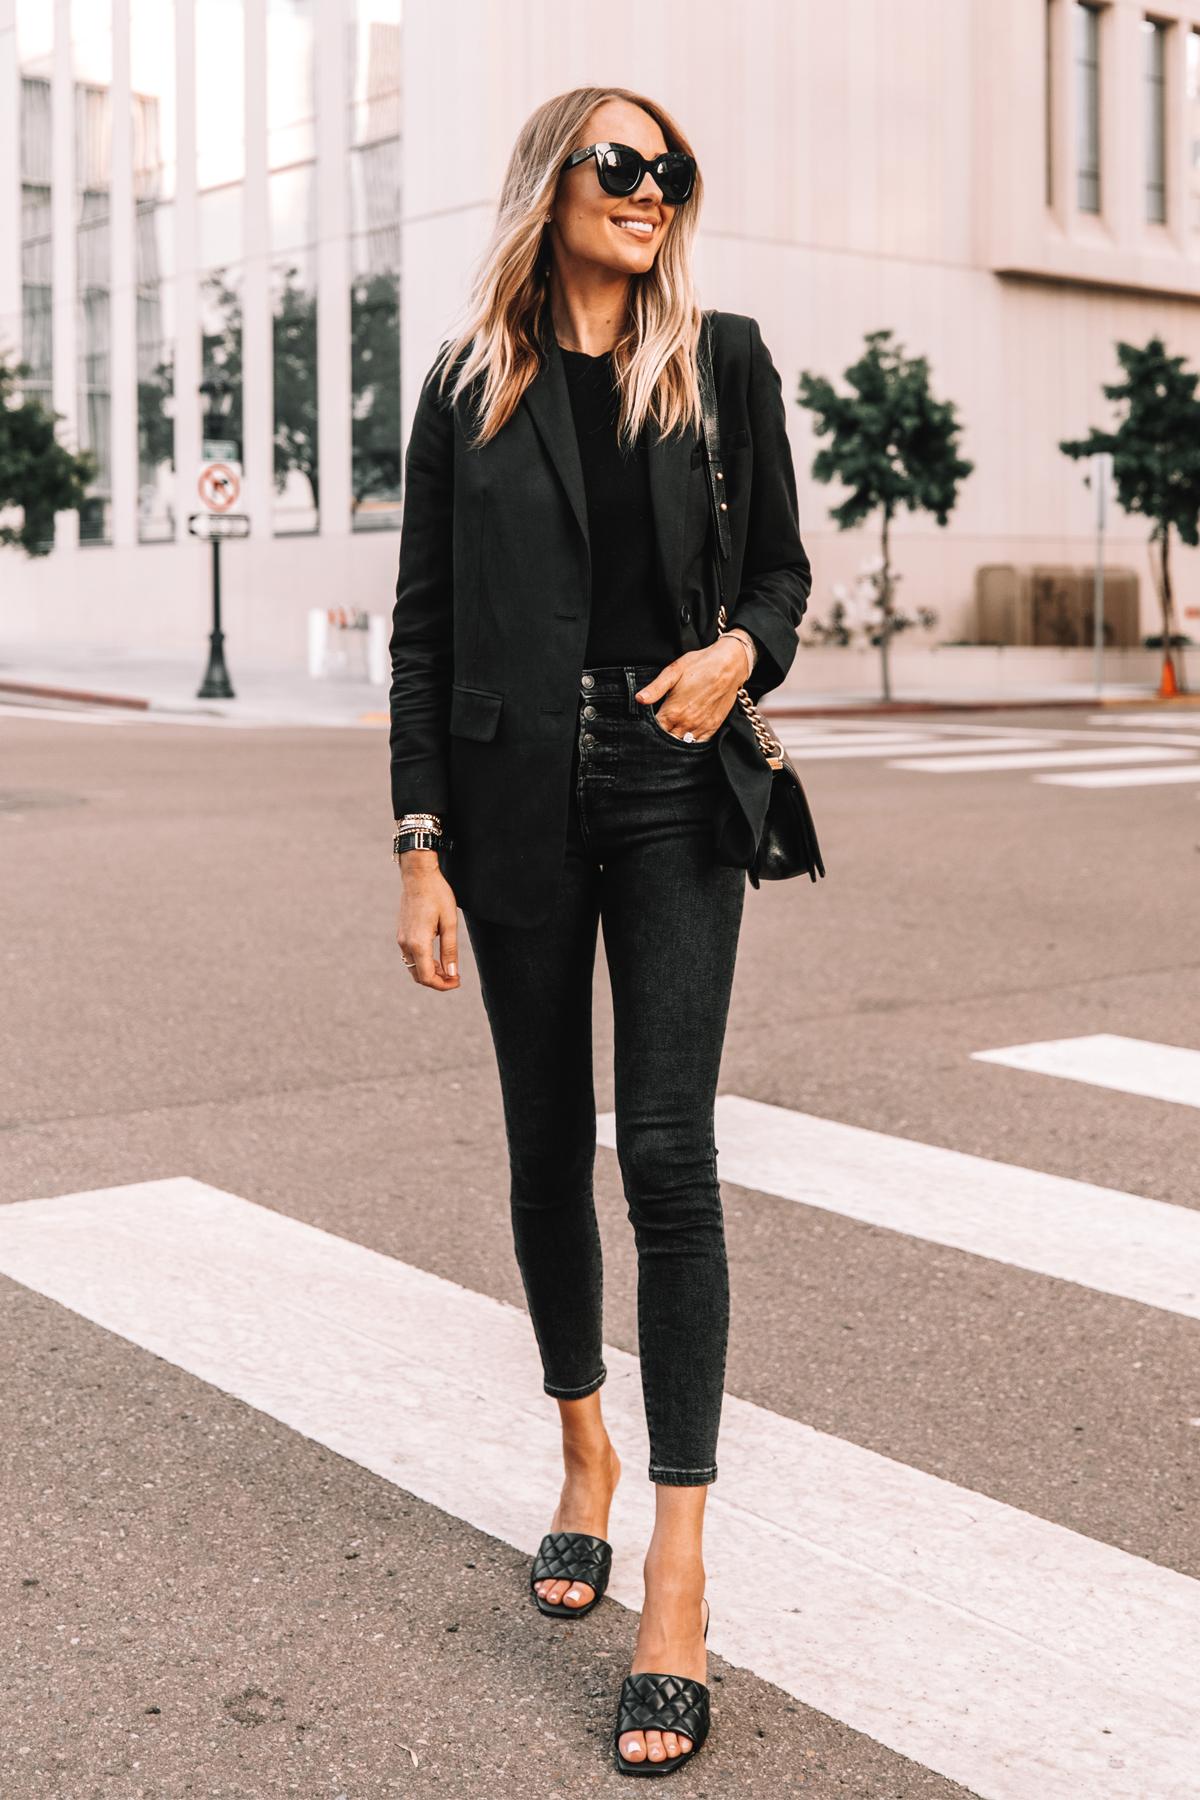 Fashion Jackson Wearing Everlane Black Blazer Everlane Black Skinny Jeans Black Heeled Sandals 2